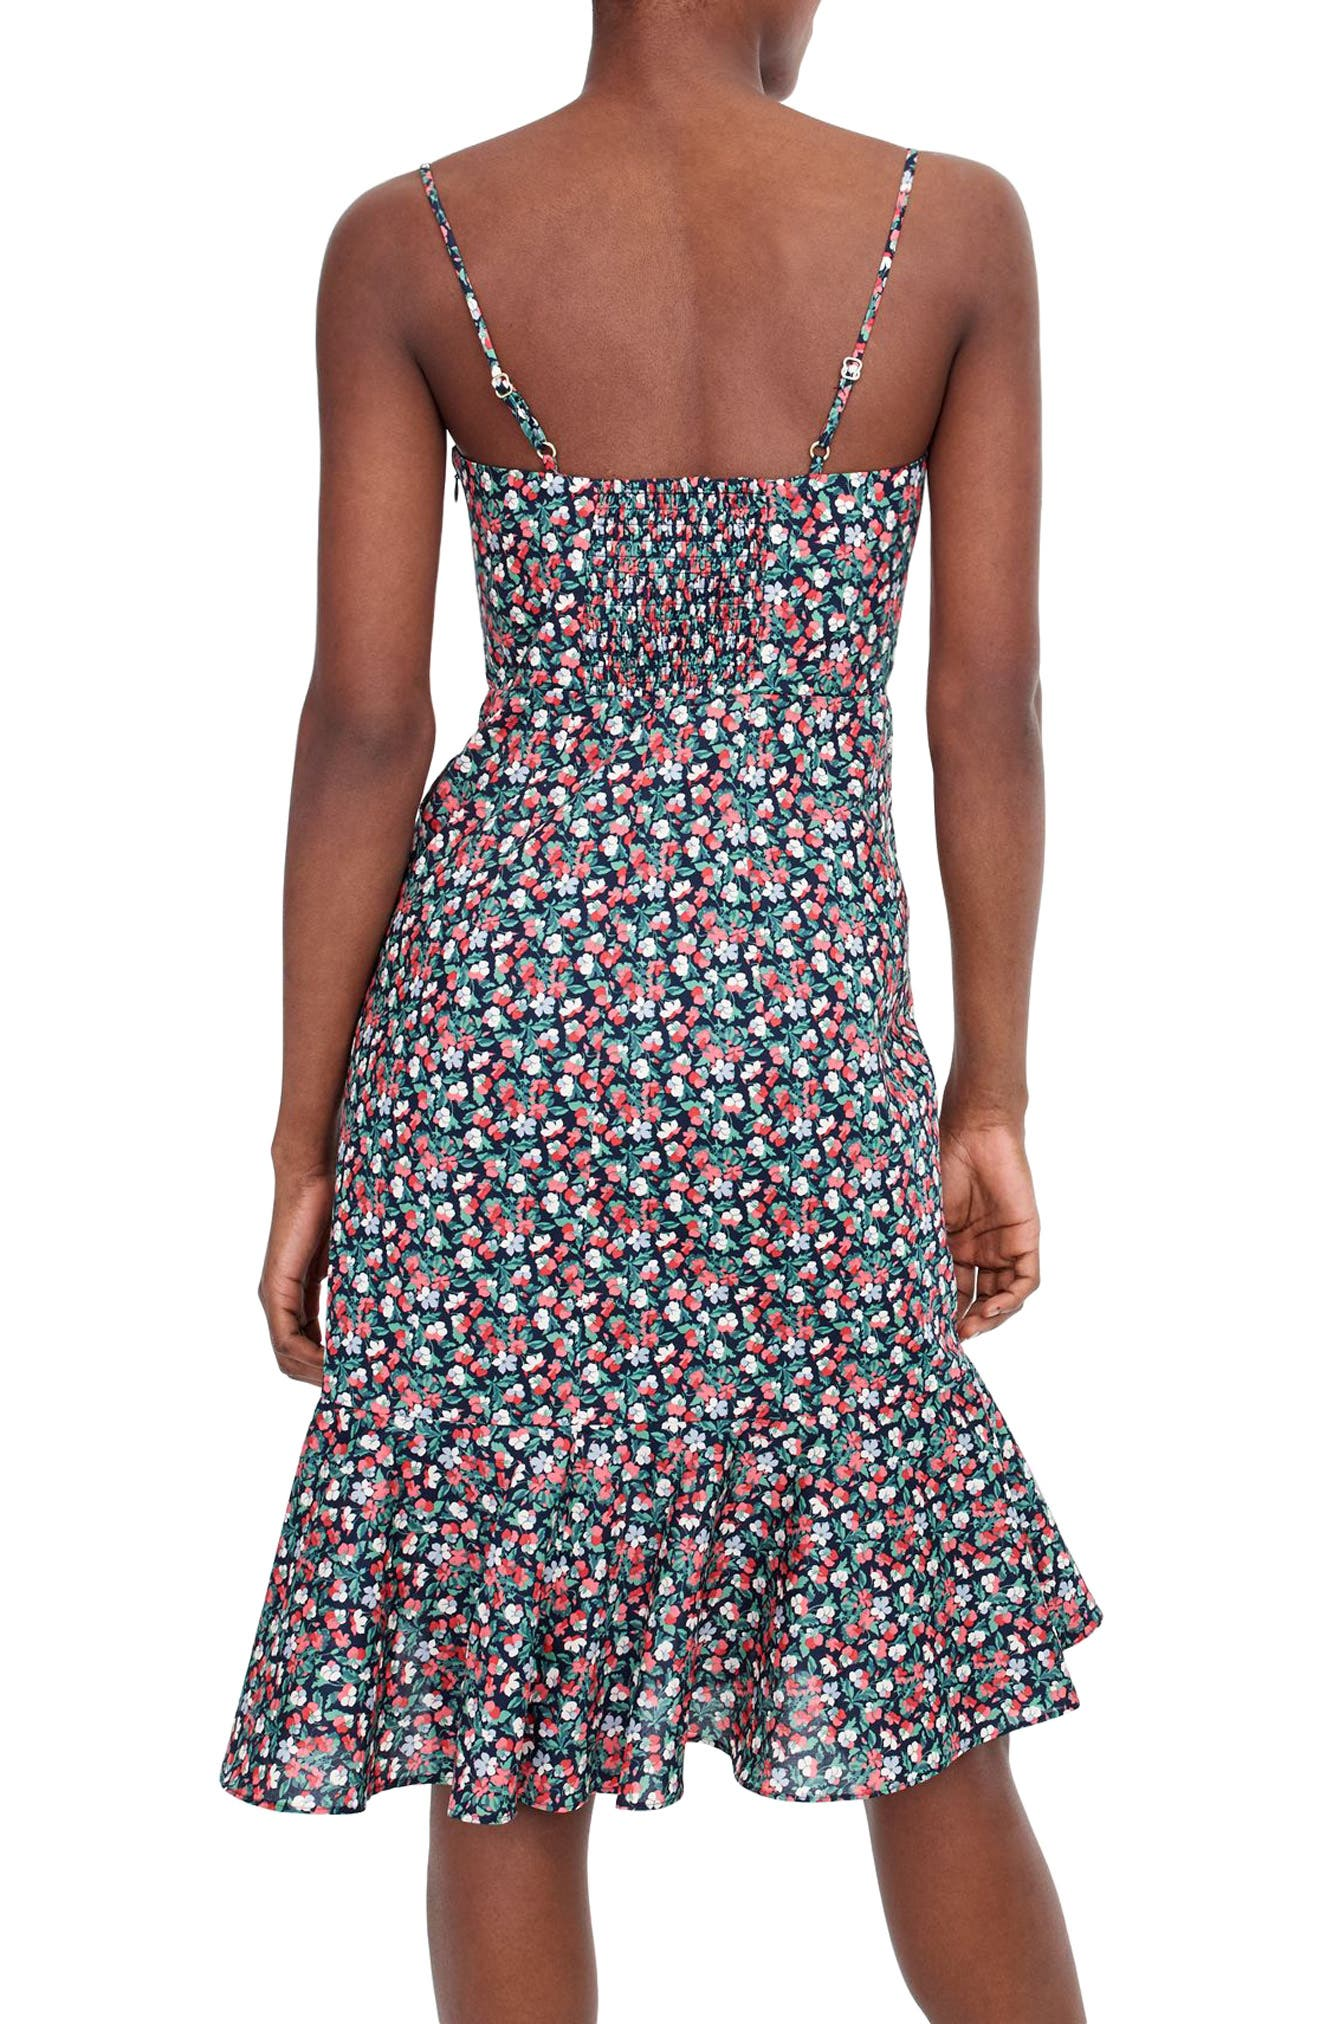 Liberty<sup>®</sup> Sarah Ruffle Dress,                             Alternate thumbnail 2, color,                             Navy Poppy